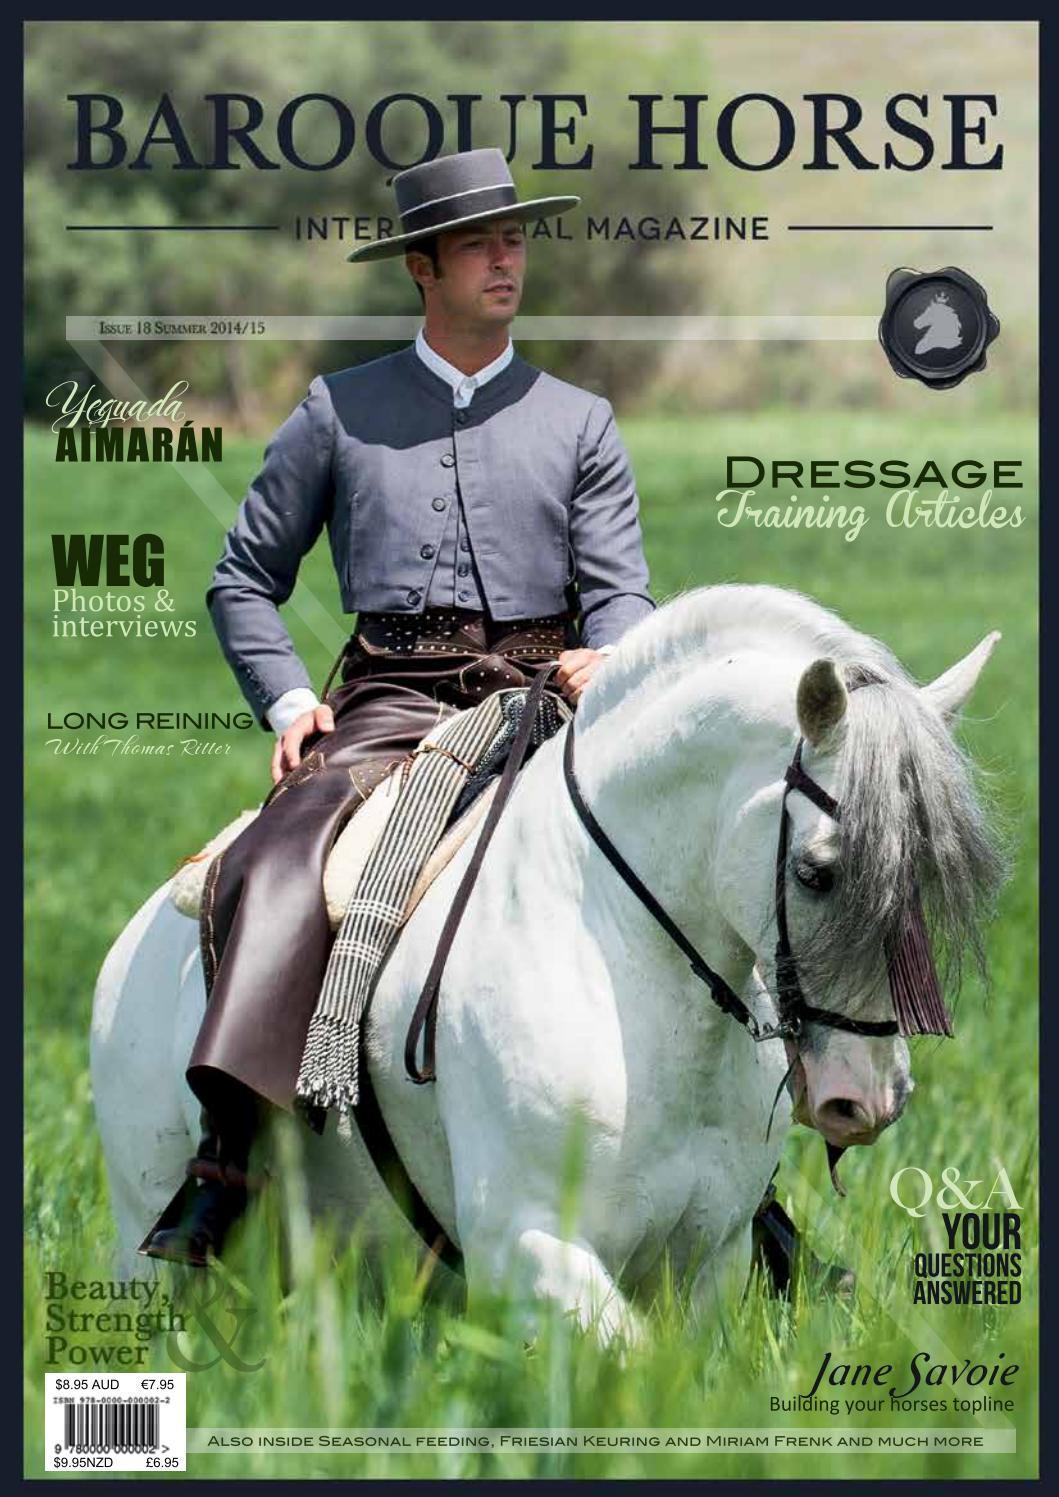 27 Baroque Horse International Magazine Covers ideas